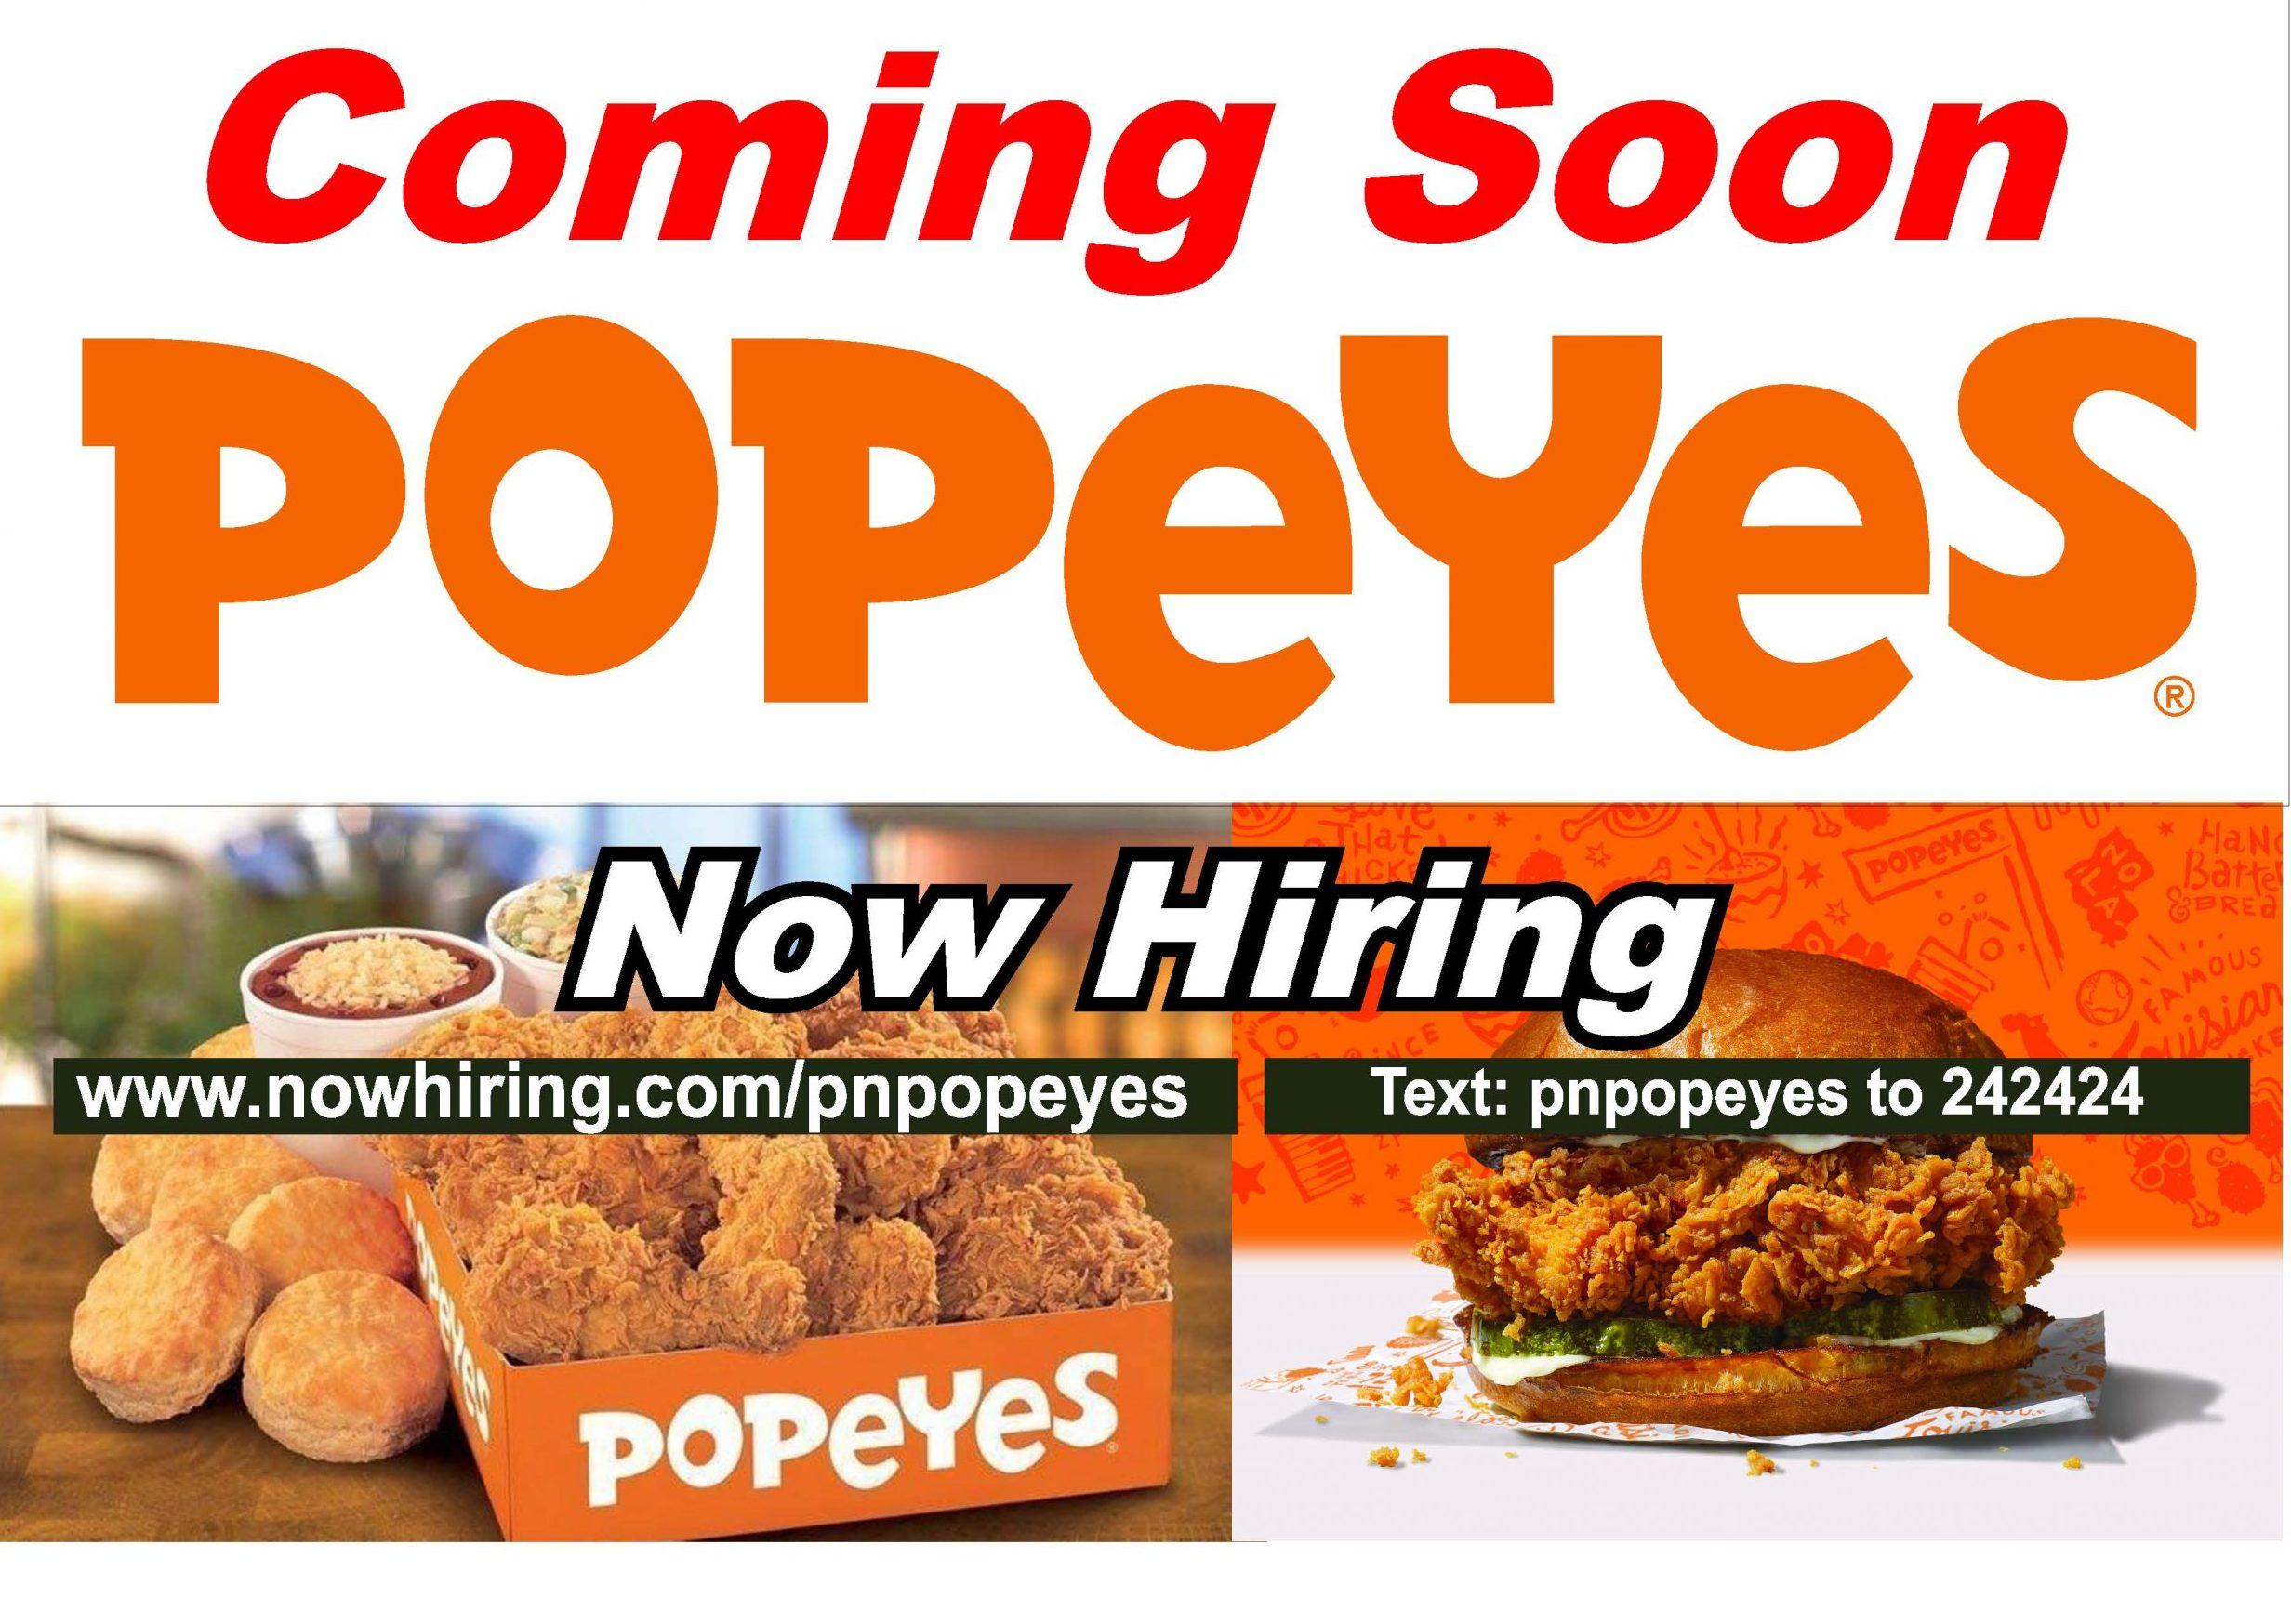 Popeyes banner